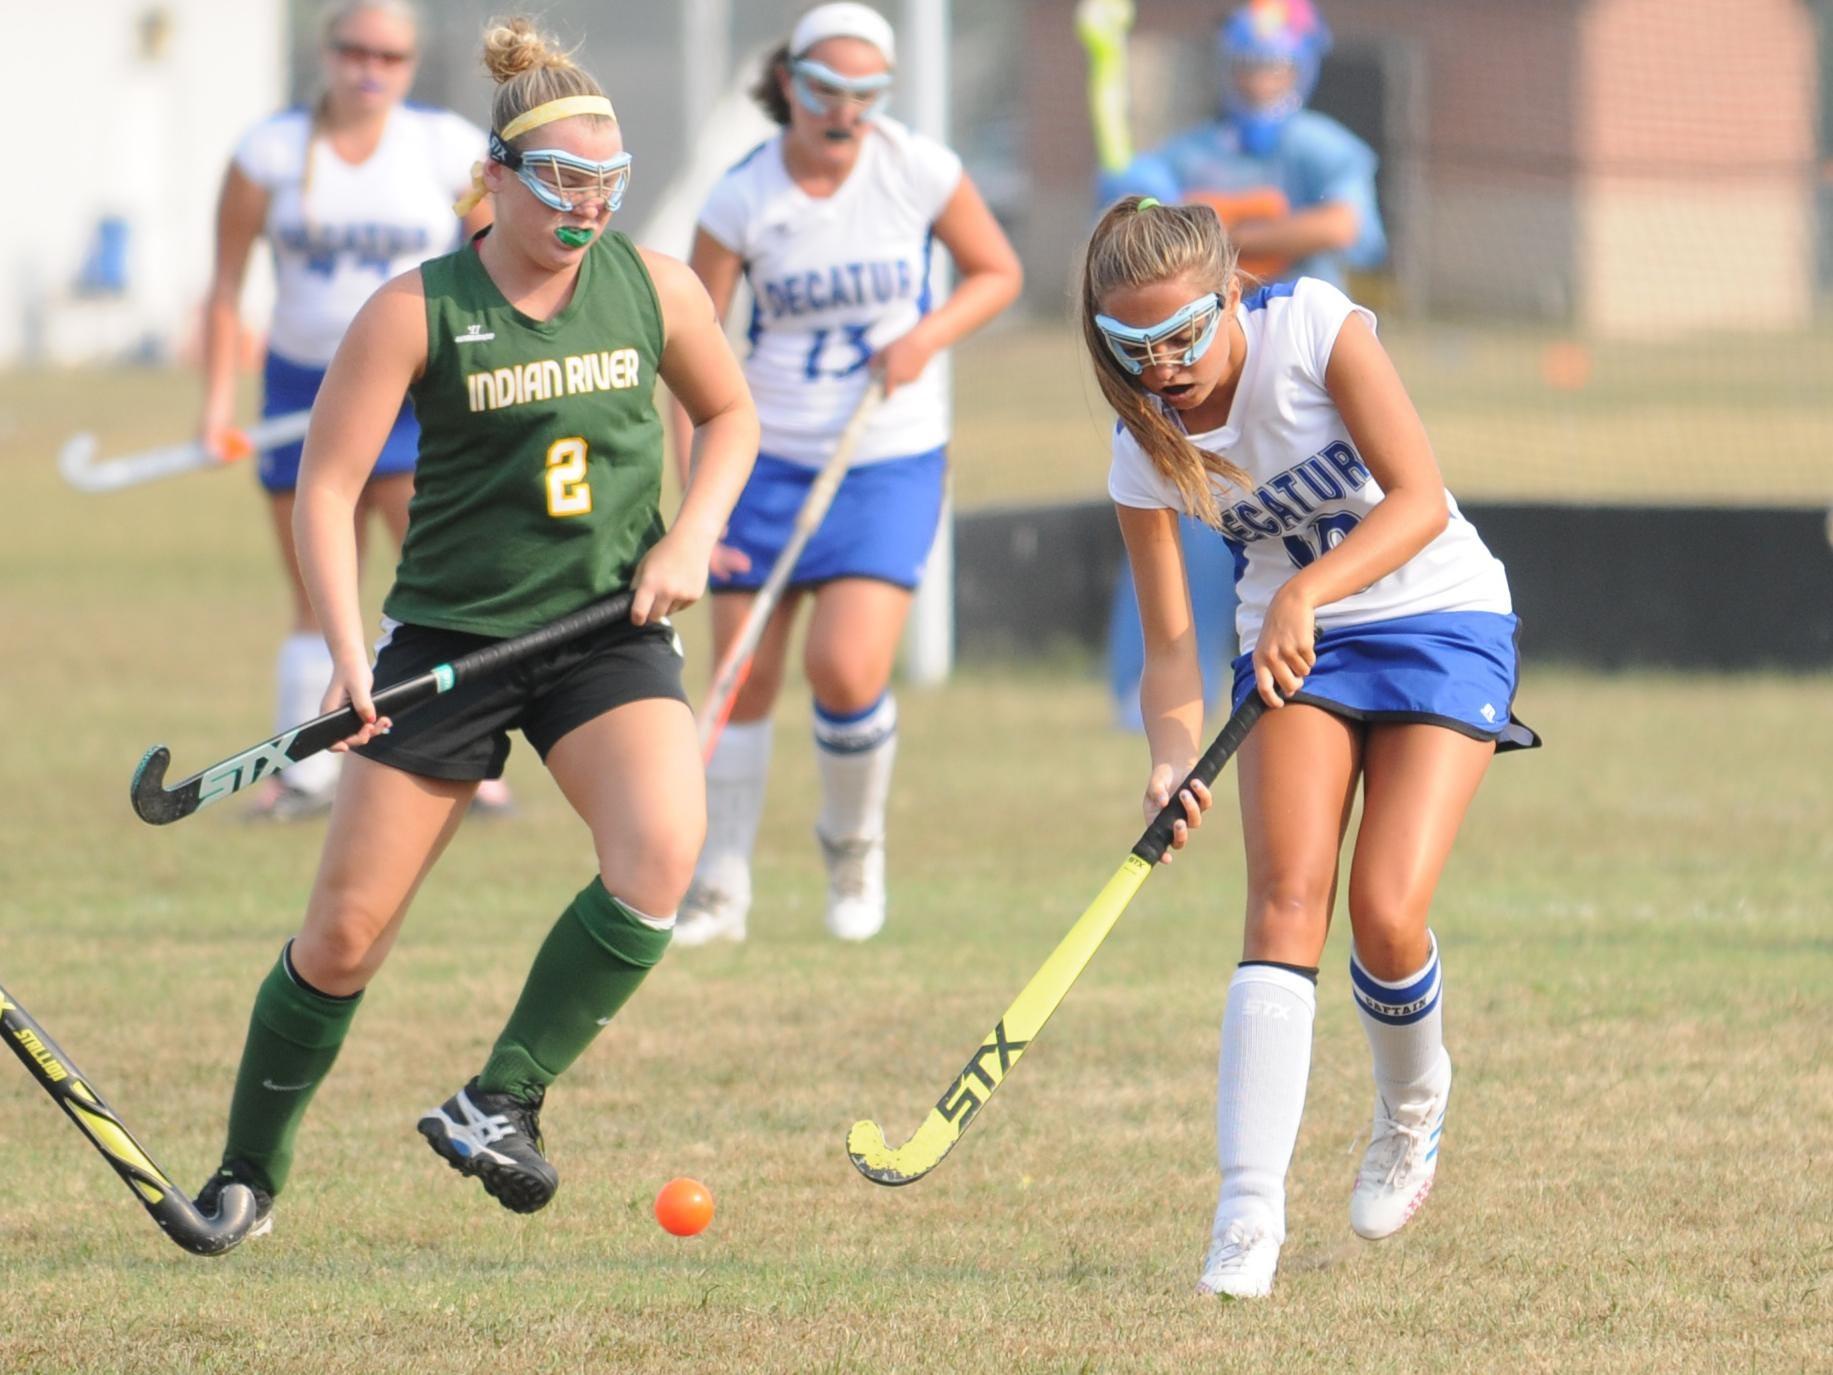 Stephen Decatur forward Olivia Kurtz works up the field against Indian River.